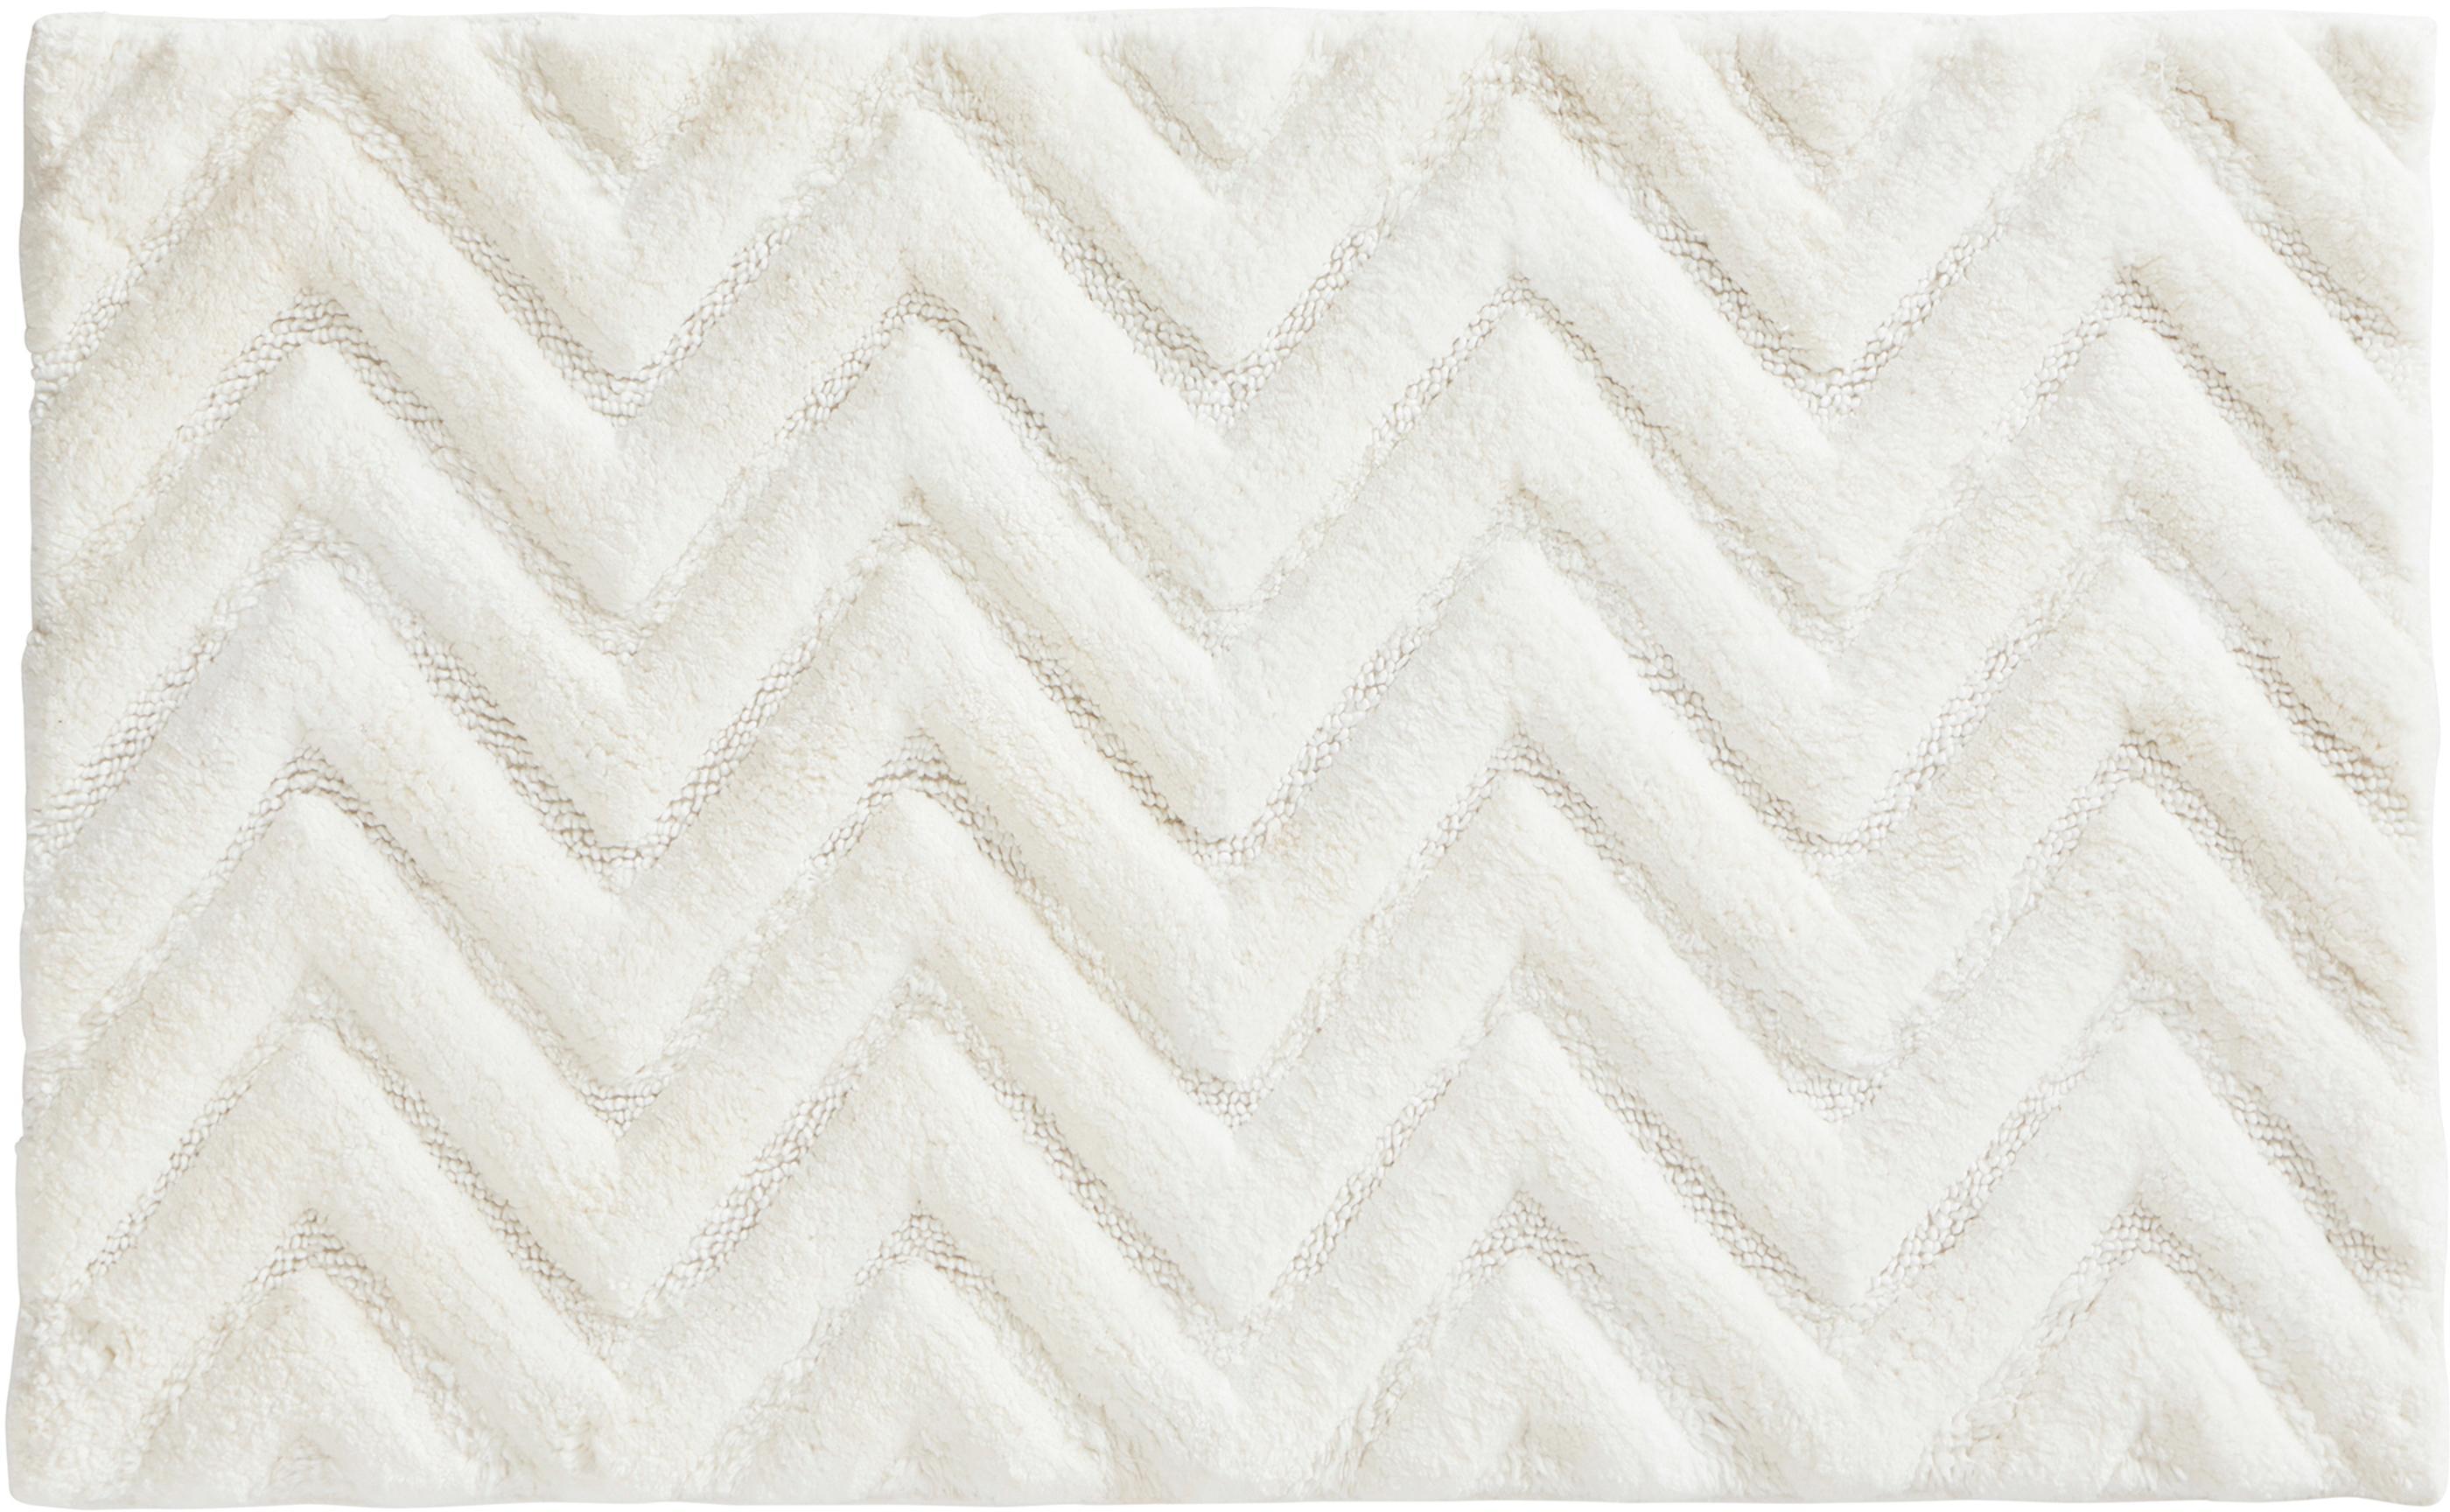 Alfombrilla de baño Arild, 100%algodón, Blanco crudo, An 50 x L 80 cm